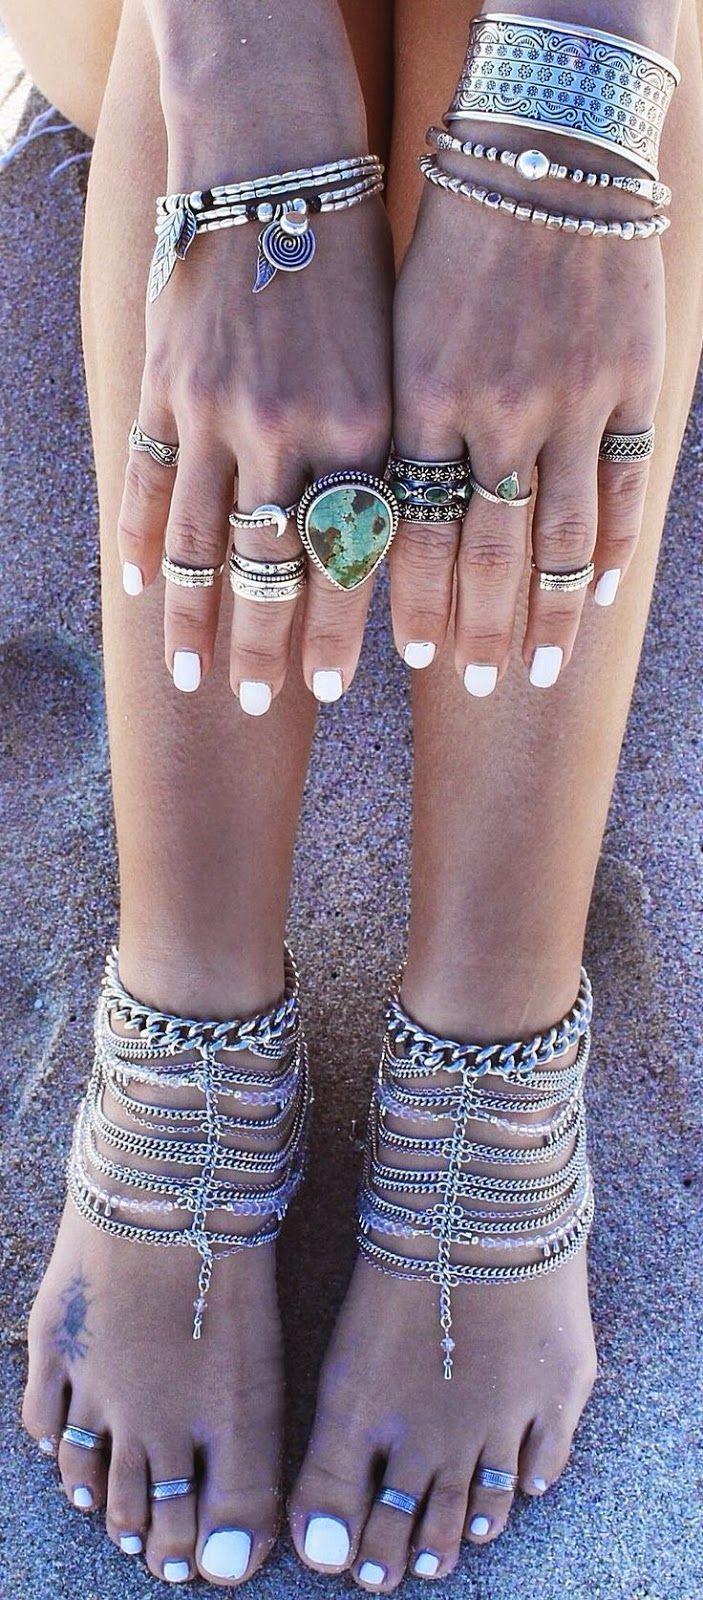 ★ ☆ 30 Beautiful Boho Jewelry For Free Spirited One! ★ ☆